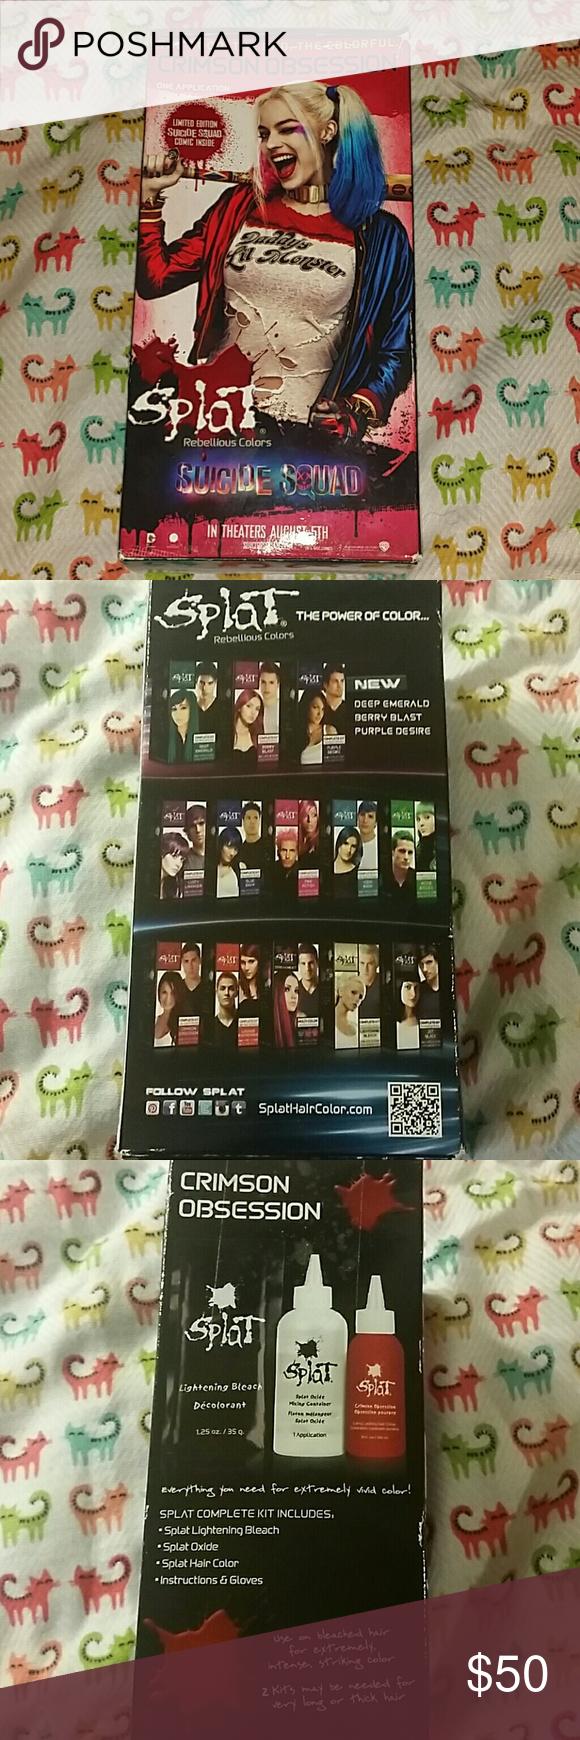 Splat Limit Edition Harley Batman Hair Dye Bleach Splat Hair Dye Kit Nwt New Box Not Used Has A Collectors Comi Harley Batman Splat Hair Dye Collectors Item